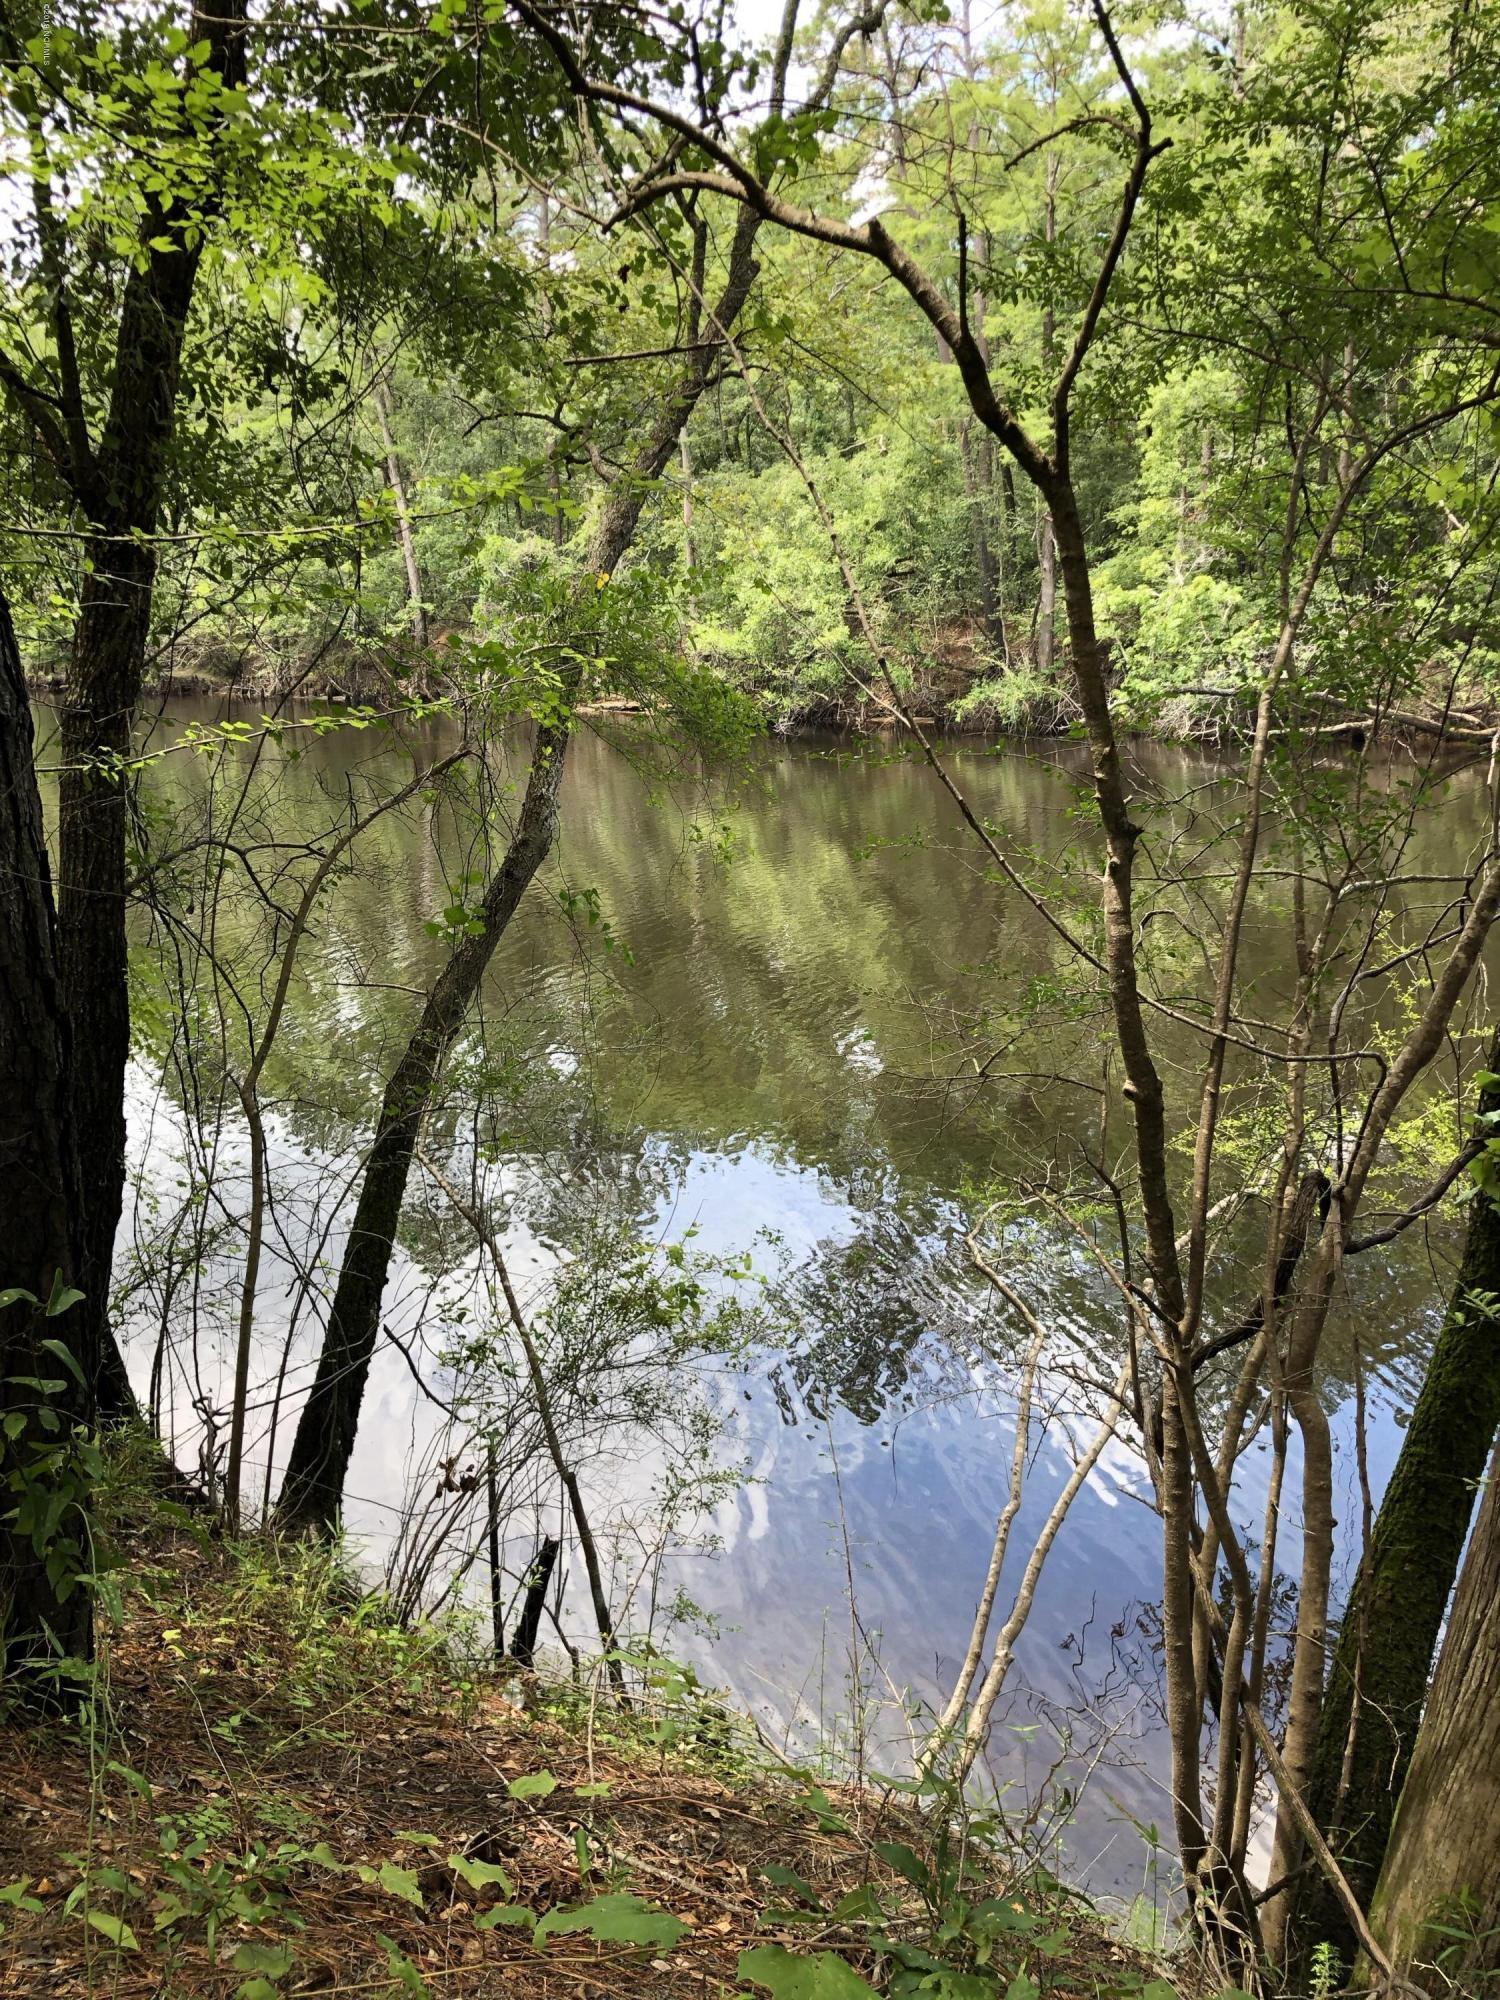 Lot 6 Beaver Trail, Burgaw, North Carolina 28425, ,Undeveloped,For sale,Beaver,100177033